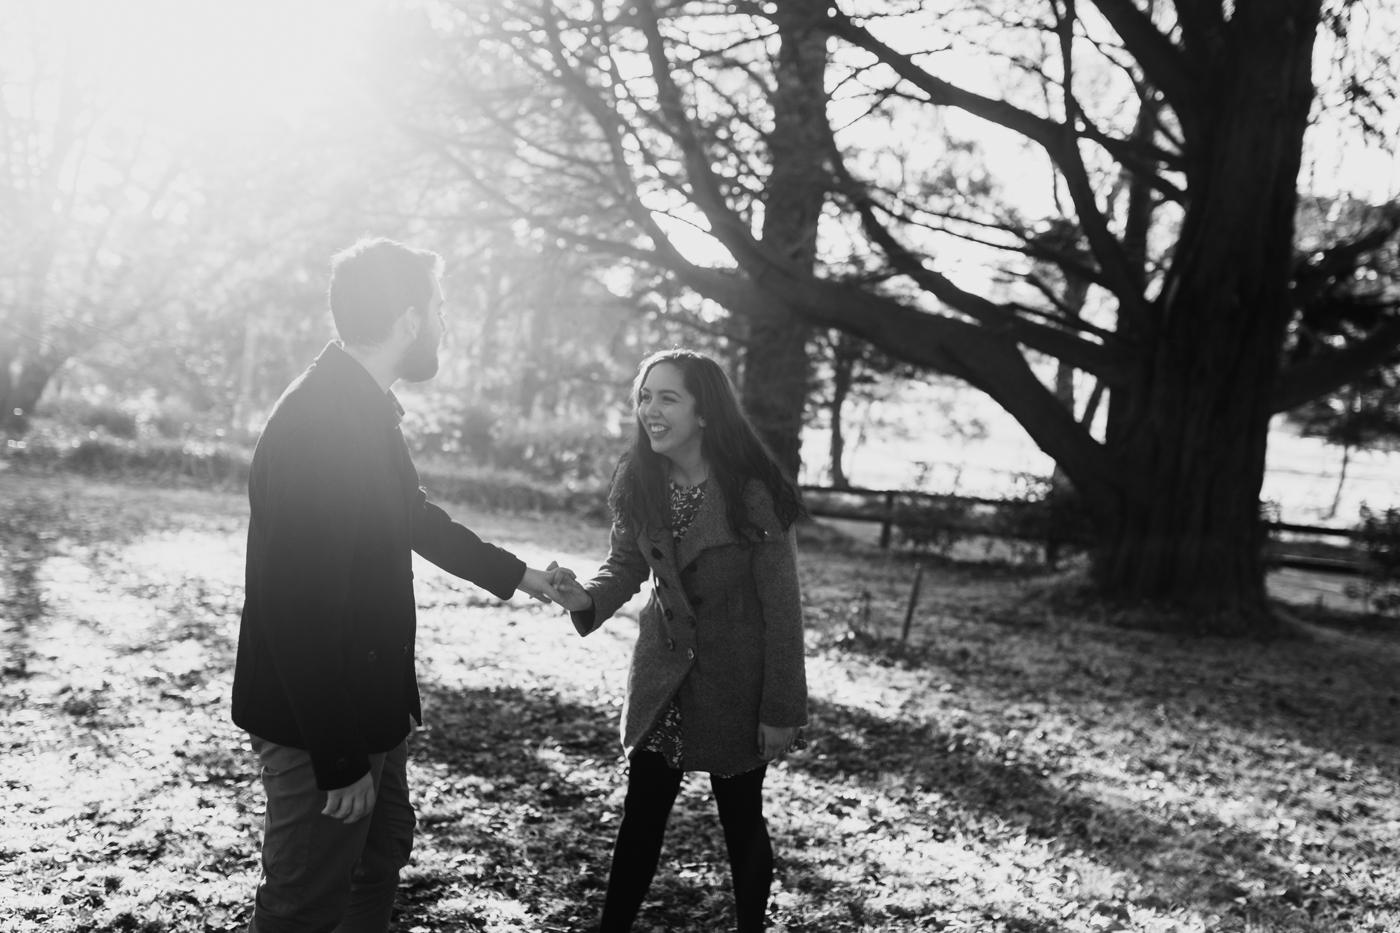 Kate & Kieran - Southern Highlands Engagement - Samantha Heather Photography-9.jpg